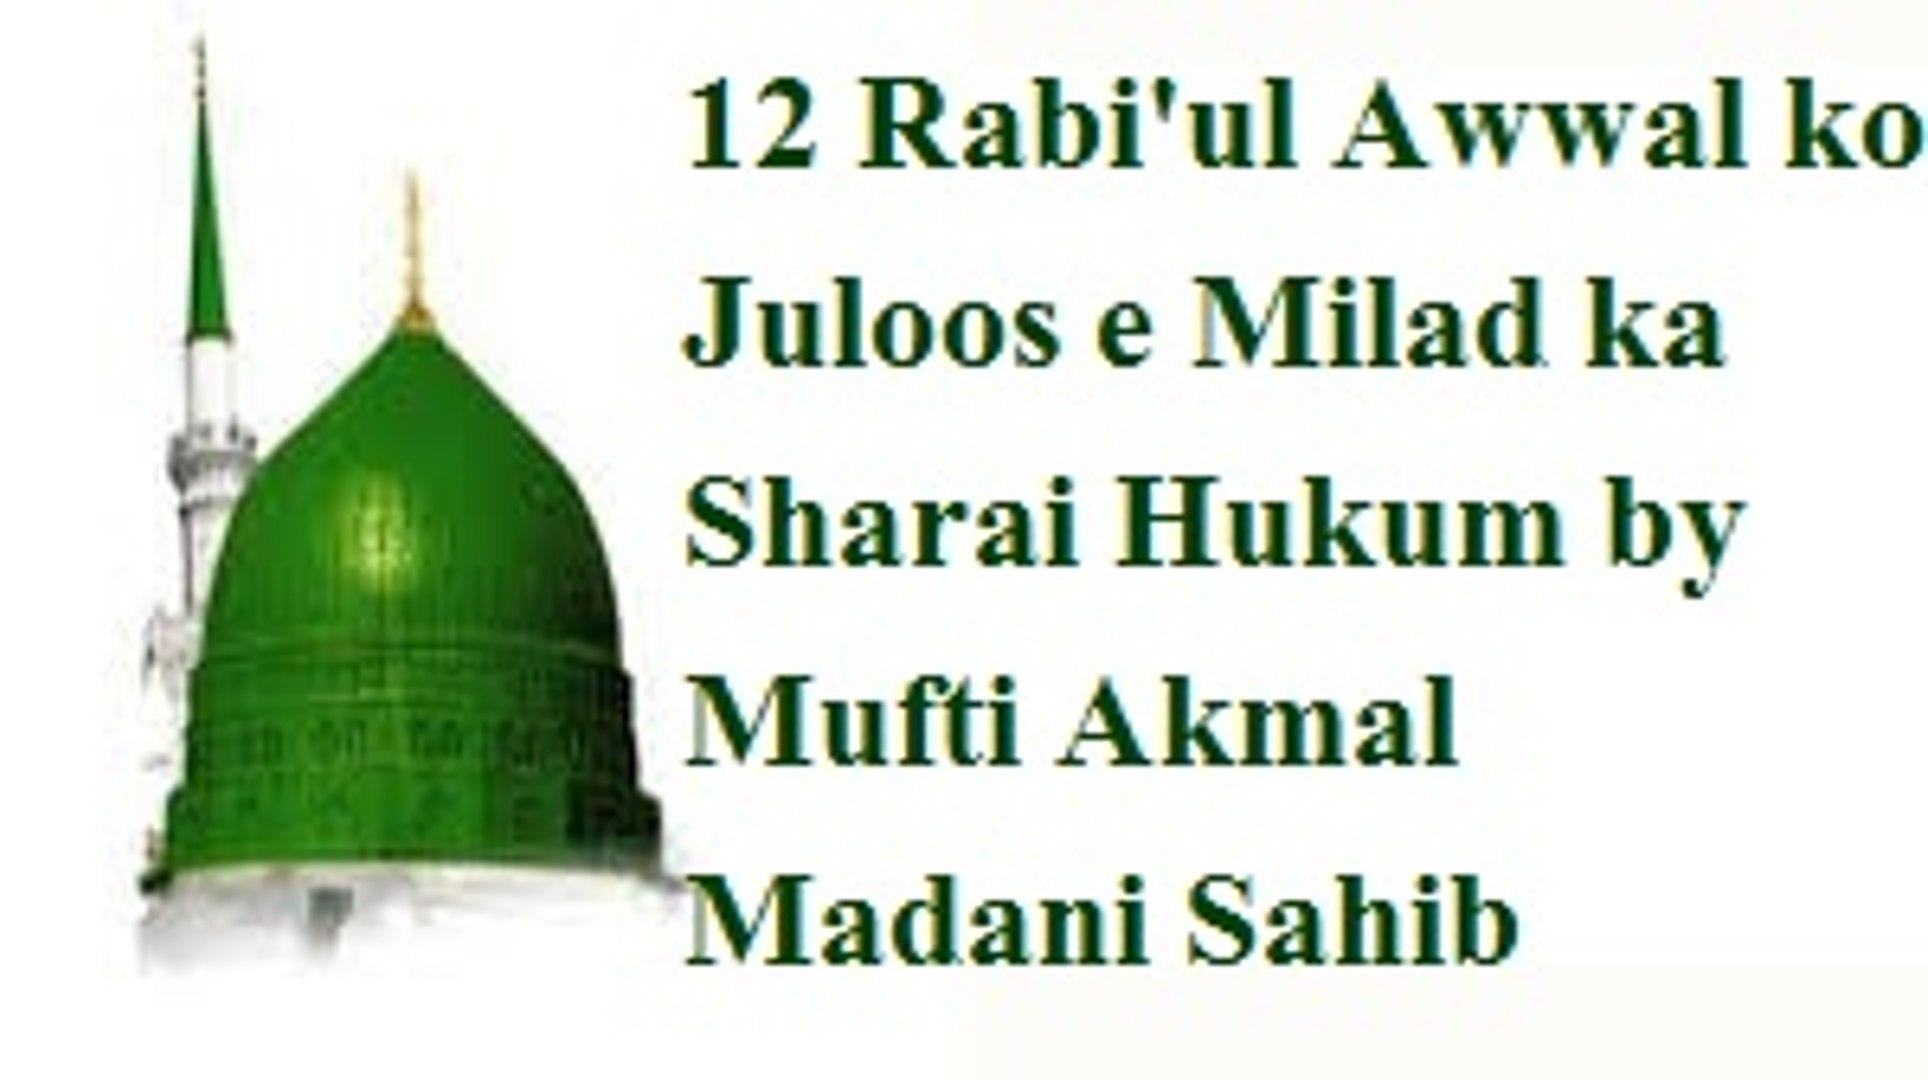 12 Rabi'ul Awwal ko Juloos e Milad ka Sharai Hukum by Mufti Akmal Madani  Sahib